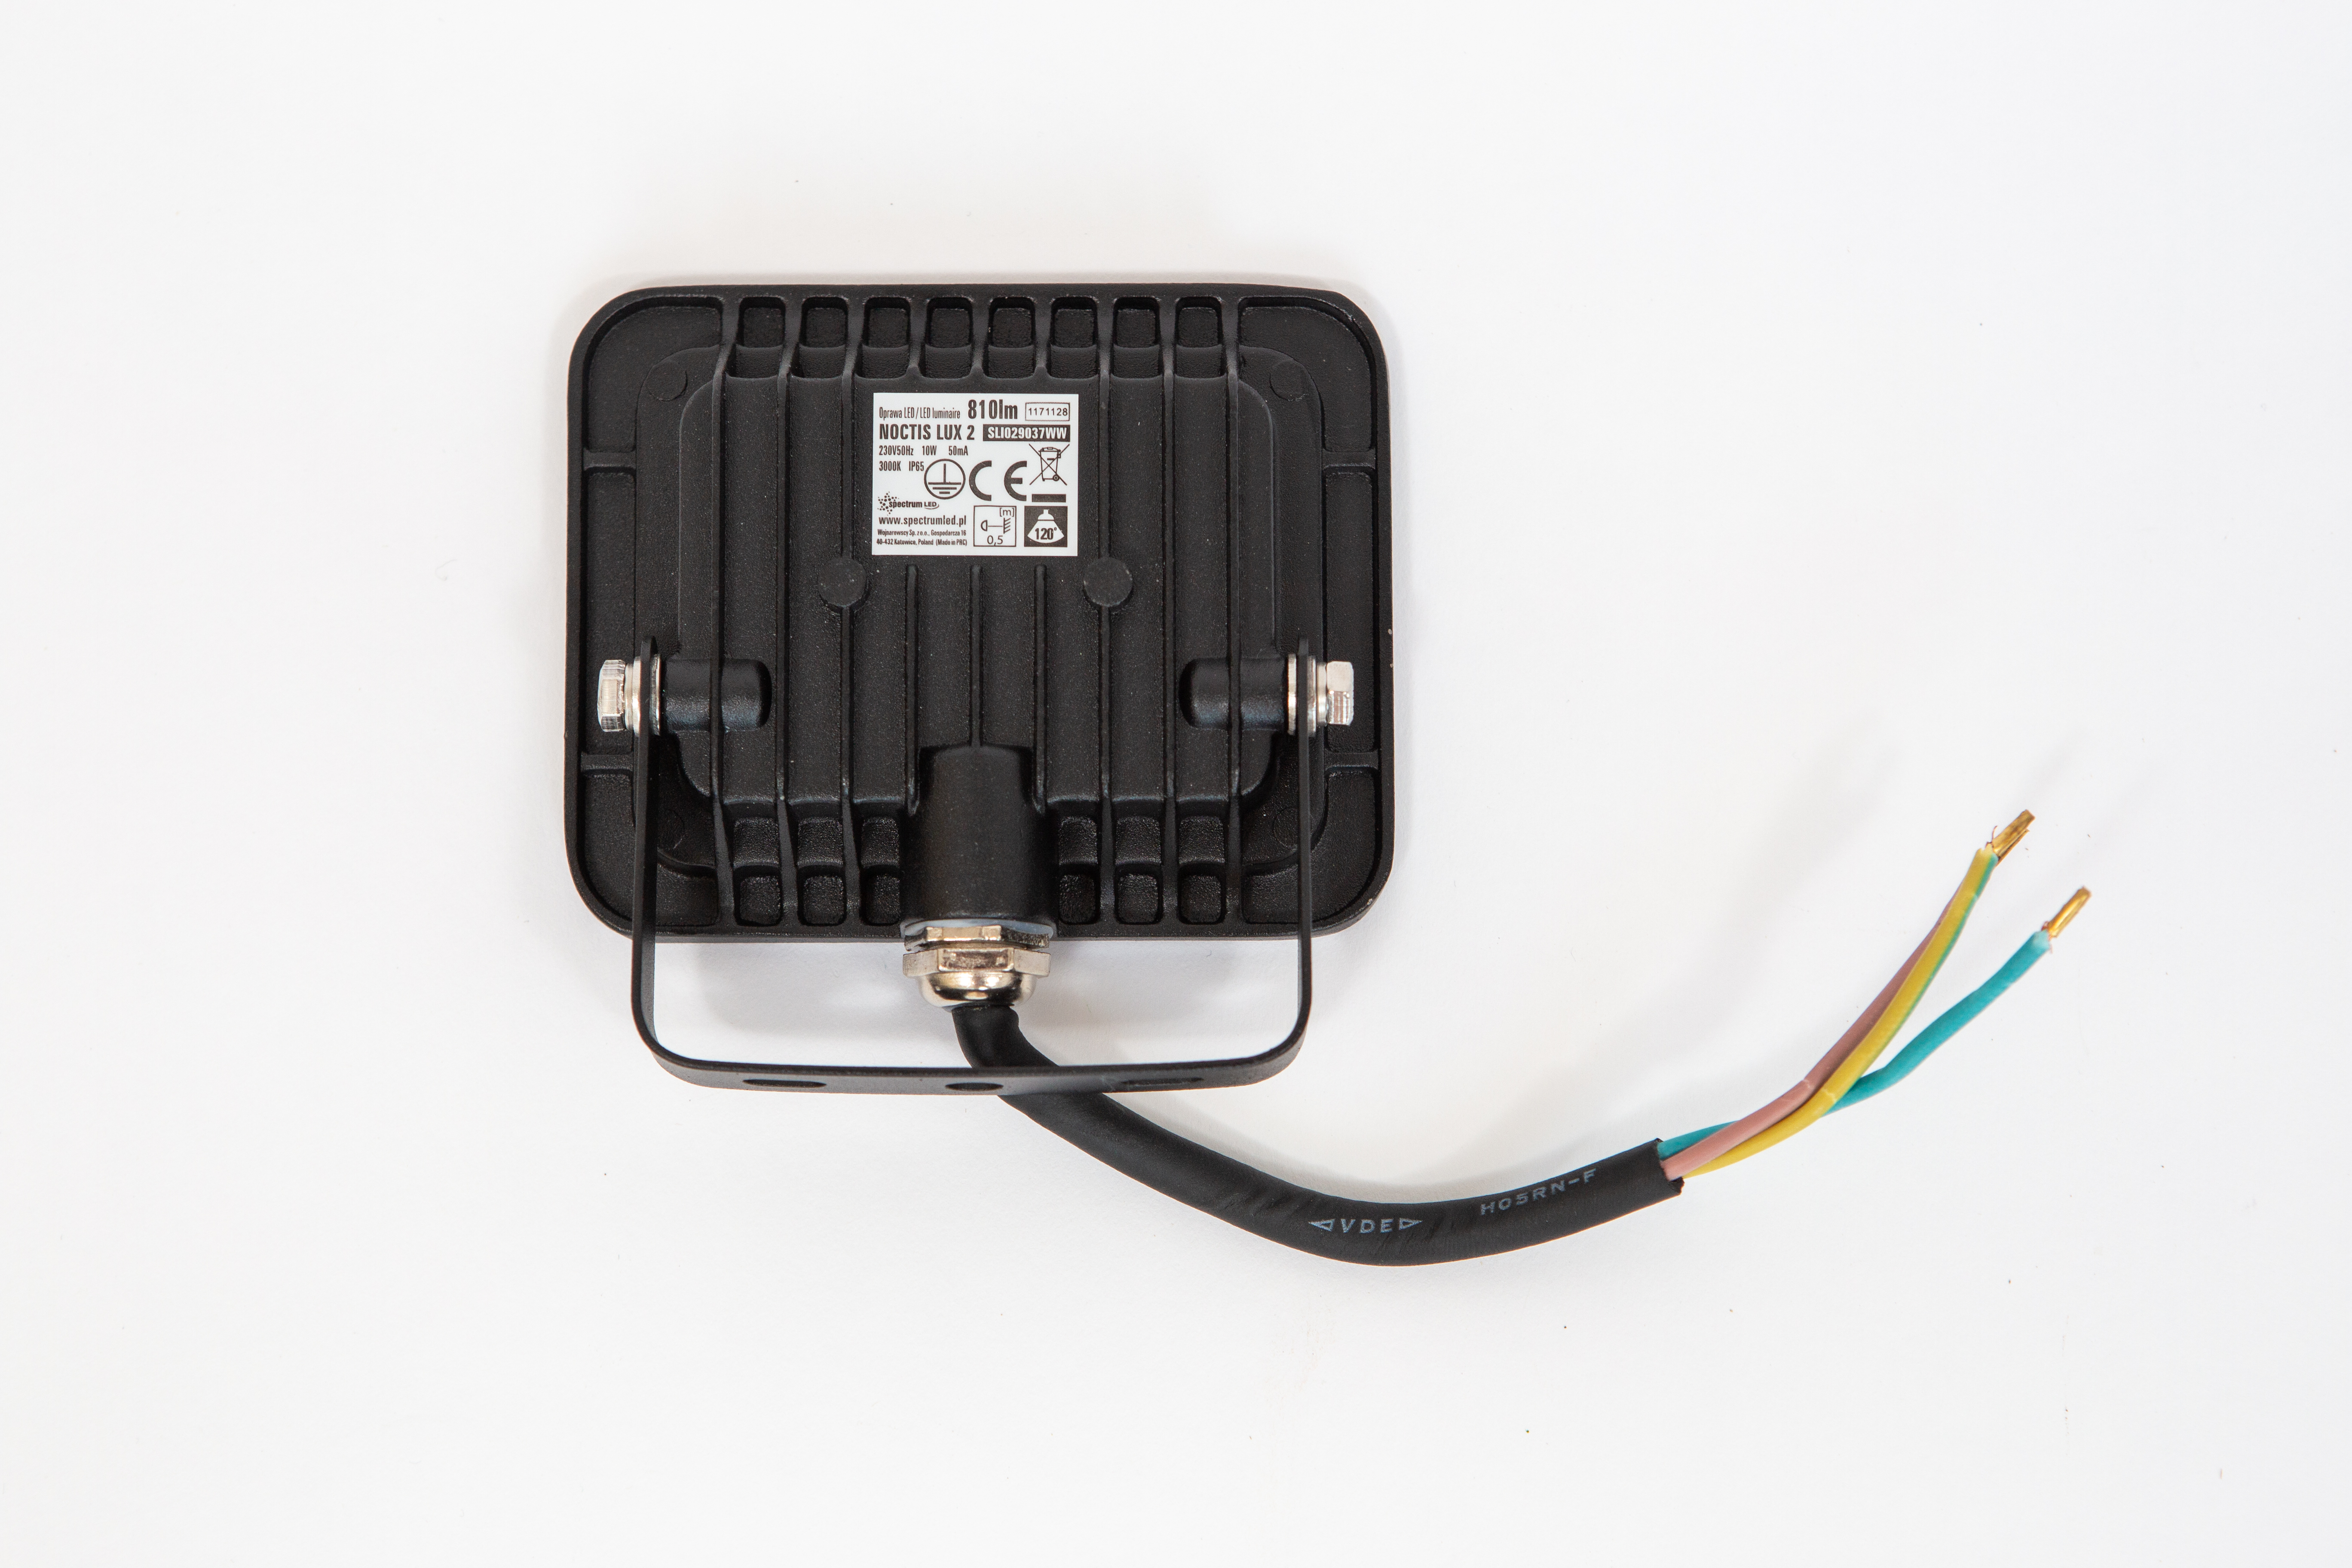 Proiector led 10 w lumina rece,810 lm, ( 6000 k ), IP 65 , 230 v,clasa a++,carcasa aluminiu negru [2]